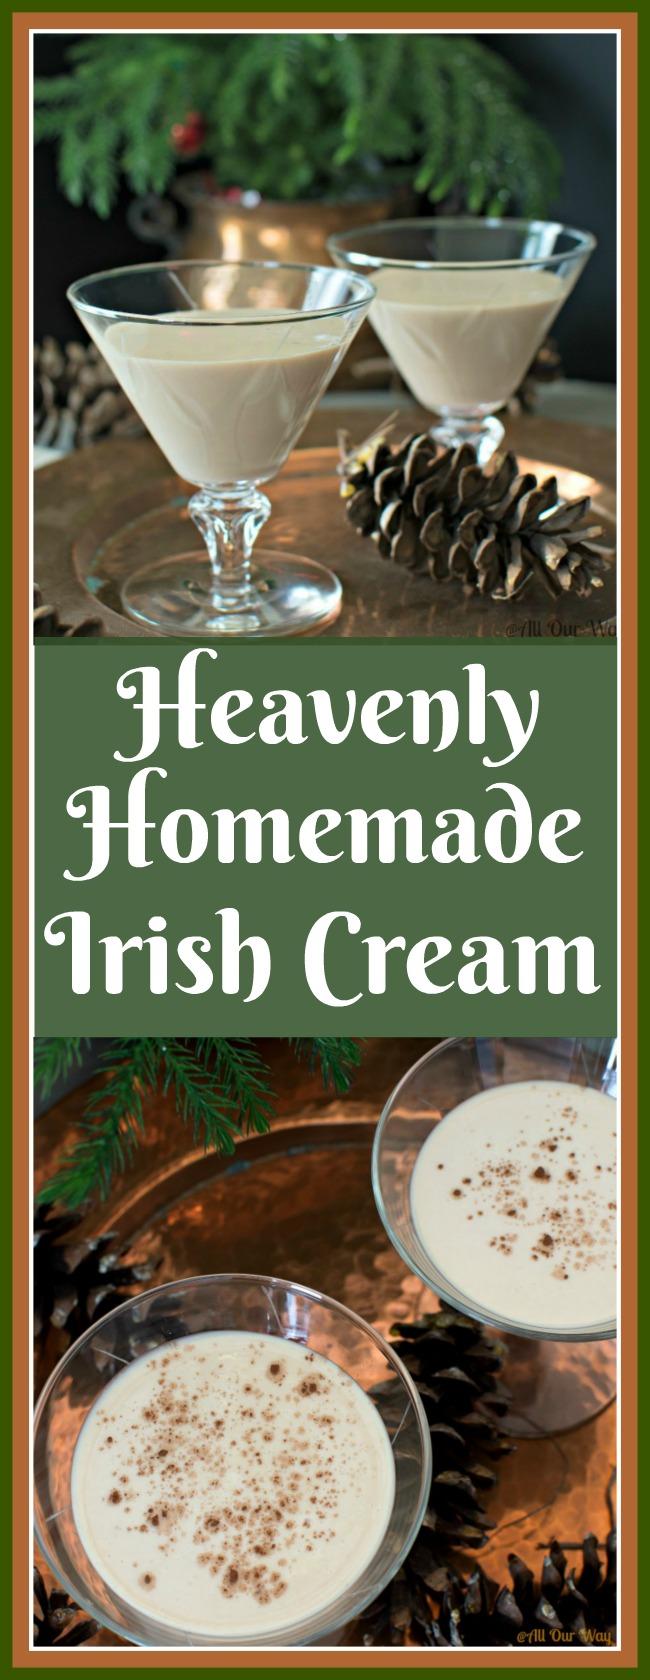 Heavenly Homemade Irish Cream is a decadent dessert in a glass @allourway.com